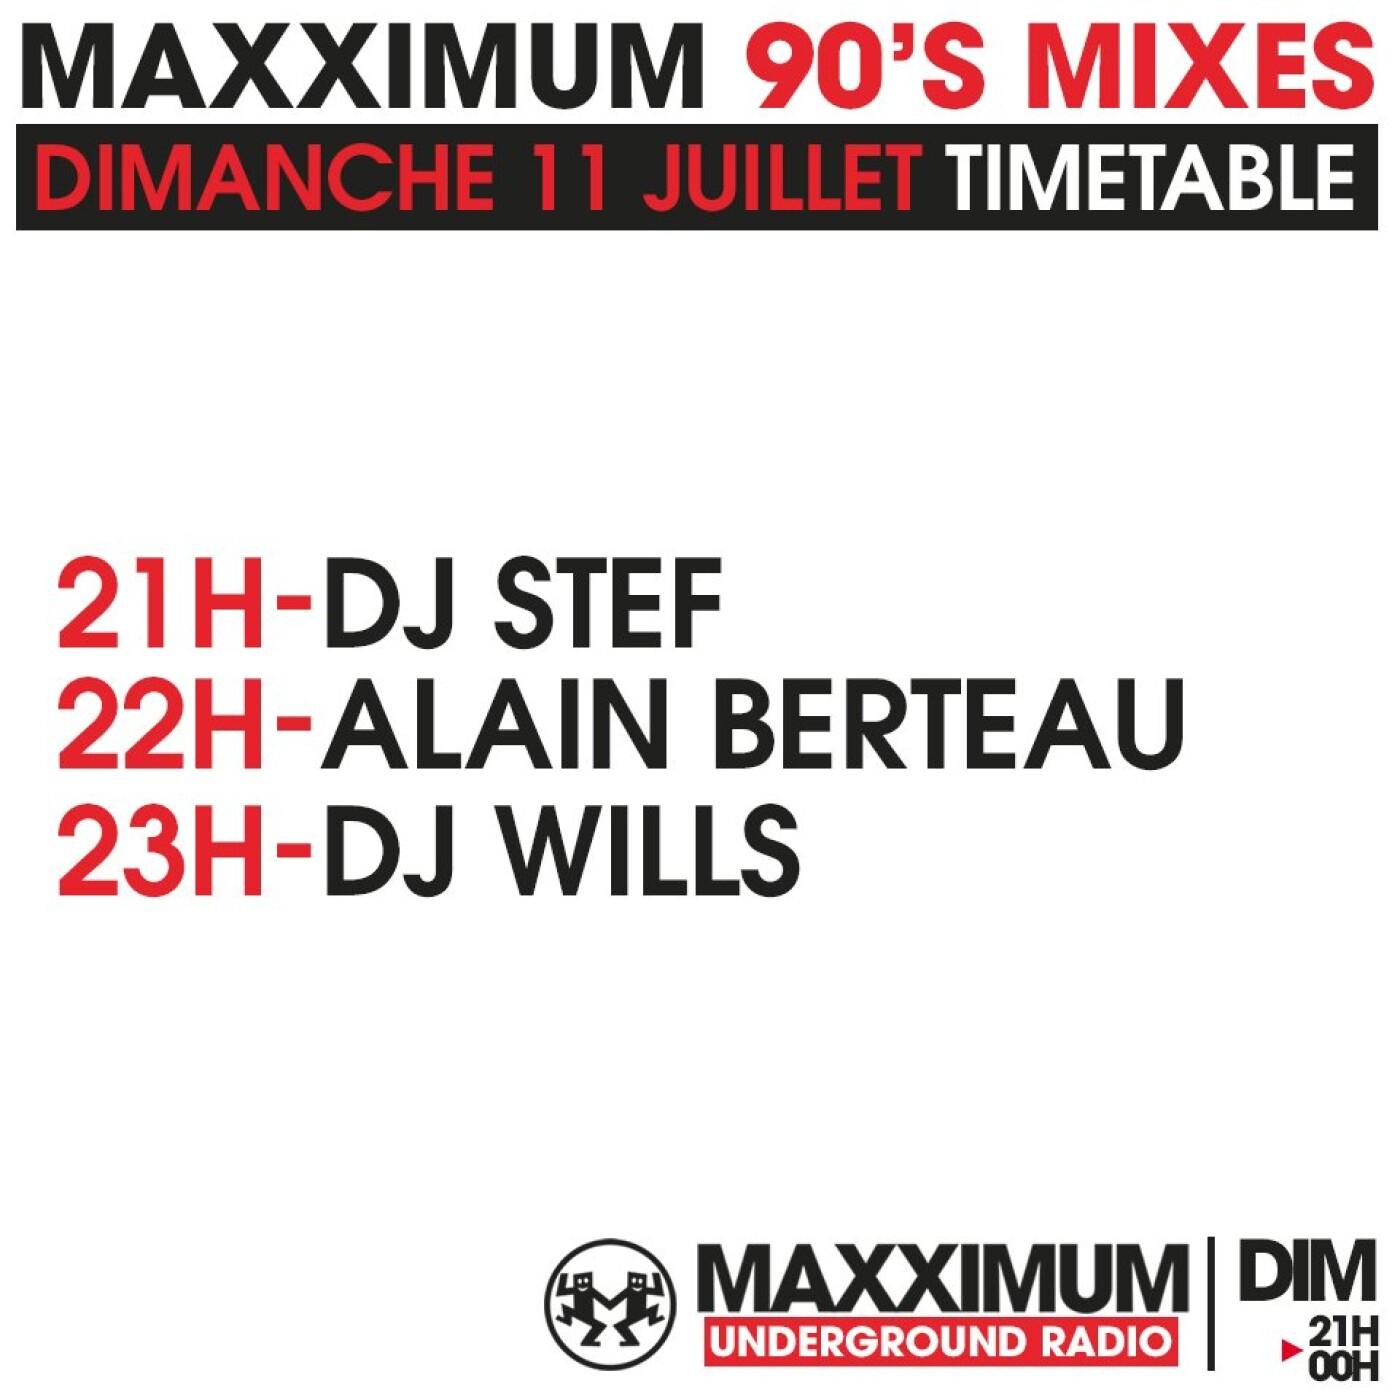 PANORAMAXX 90'S : DJ STEF